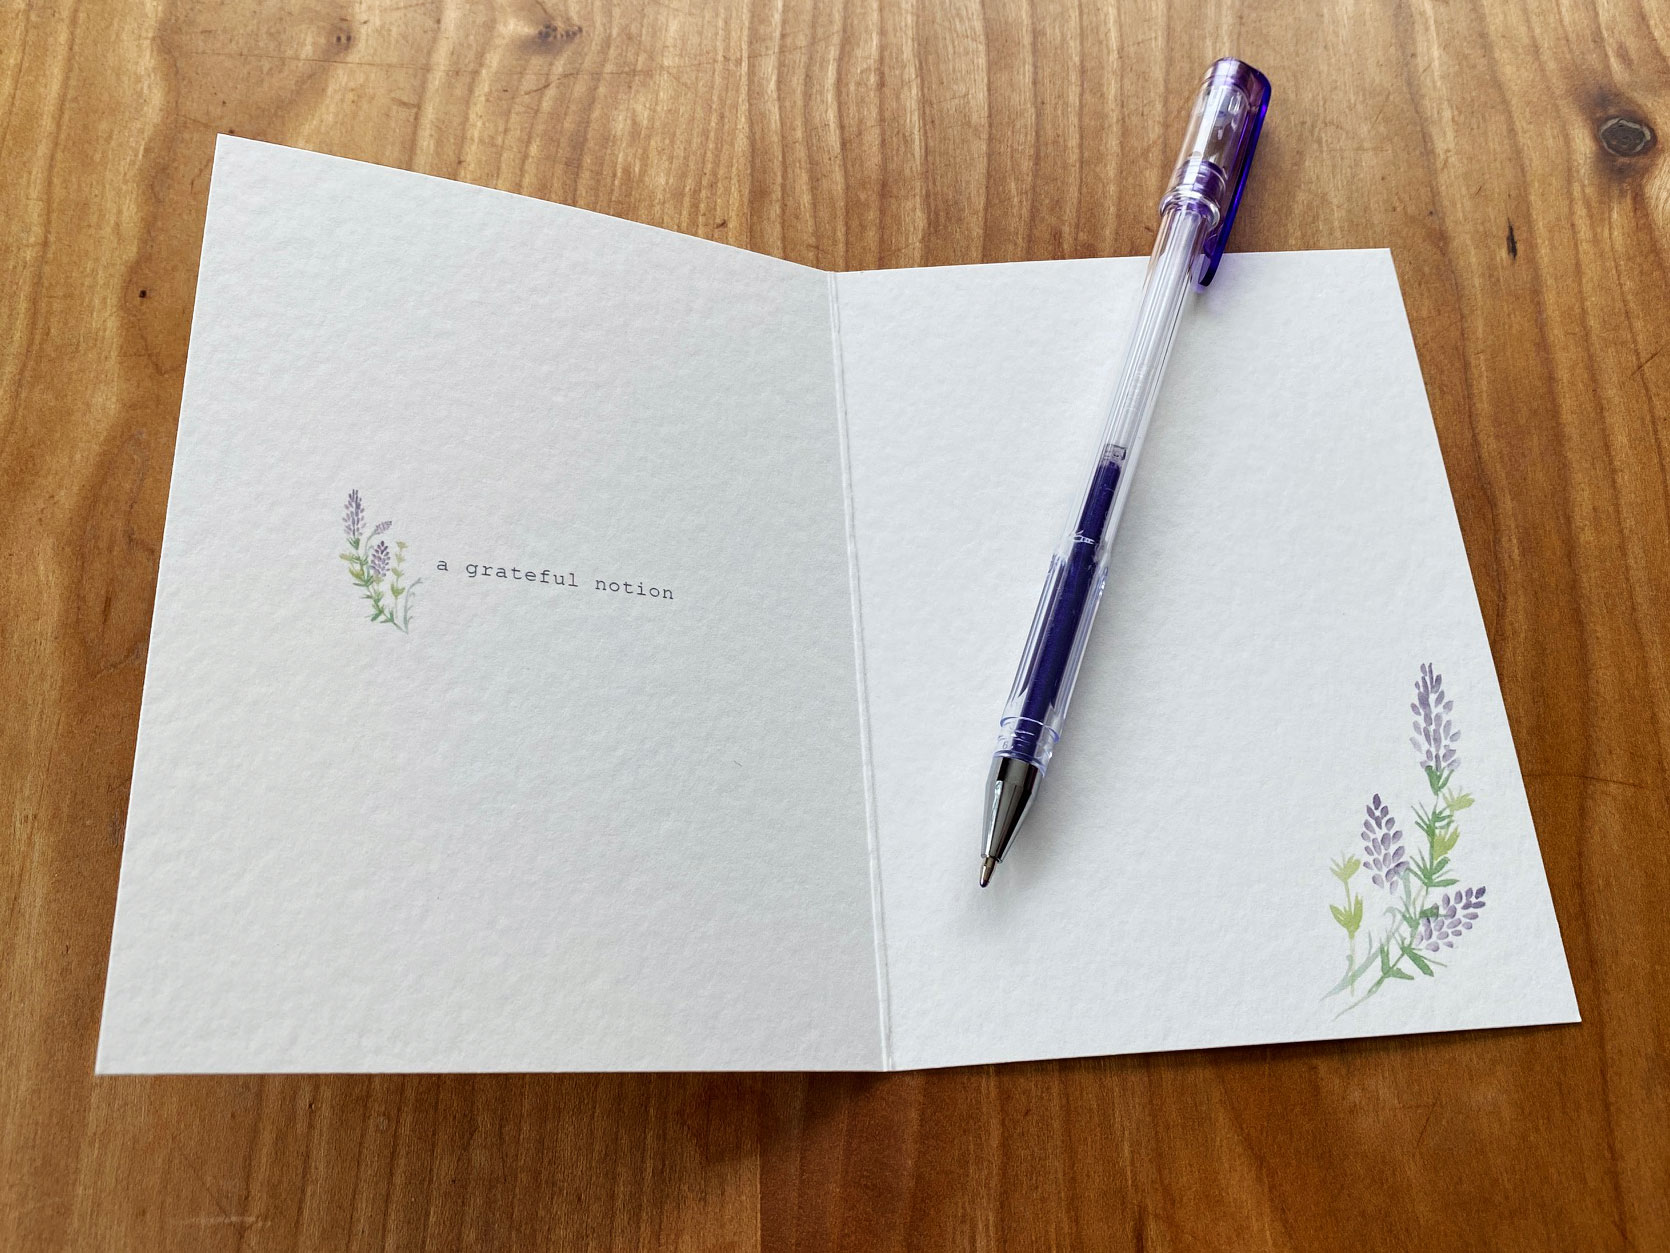 Inside details of a Kindness Roots gratitude card